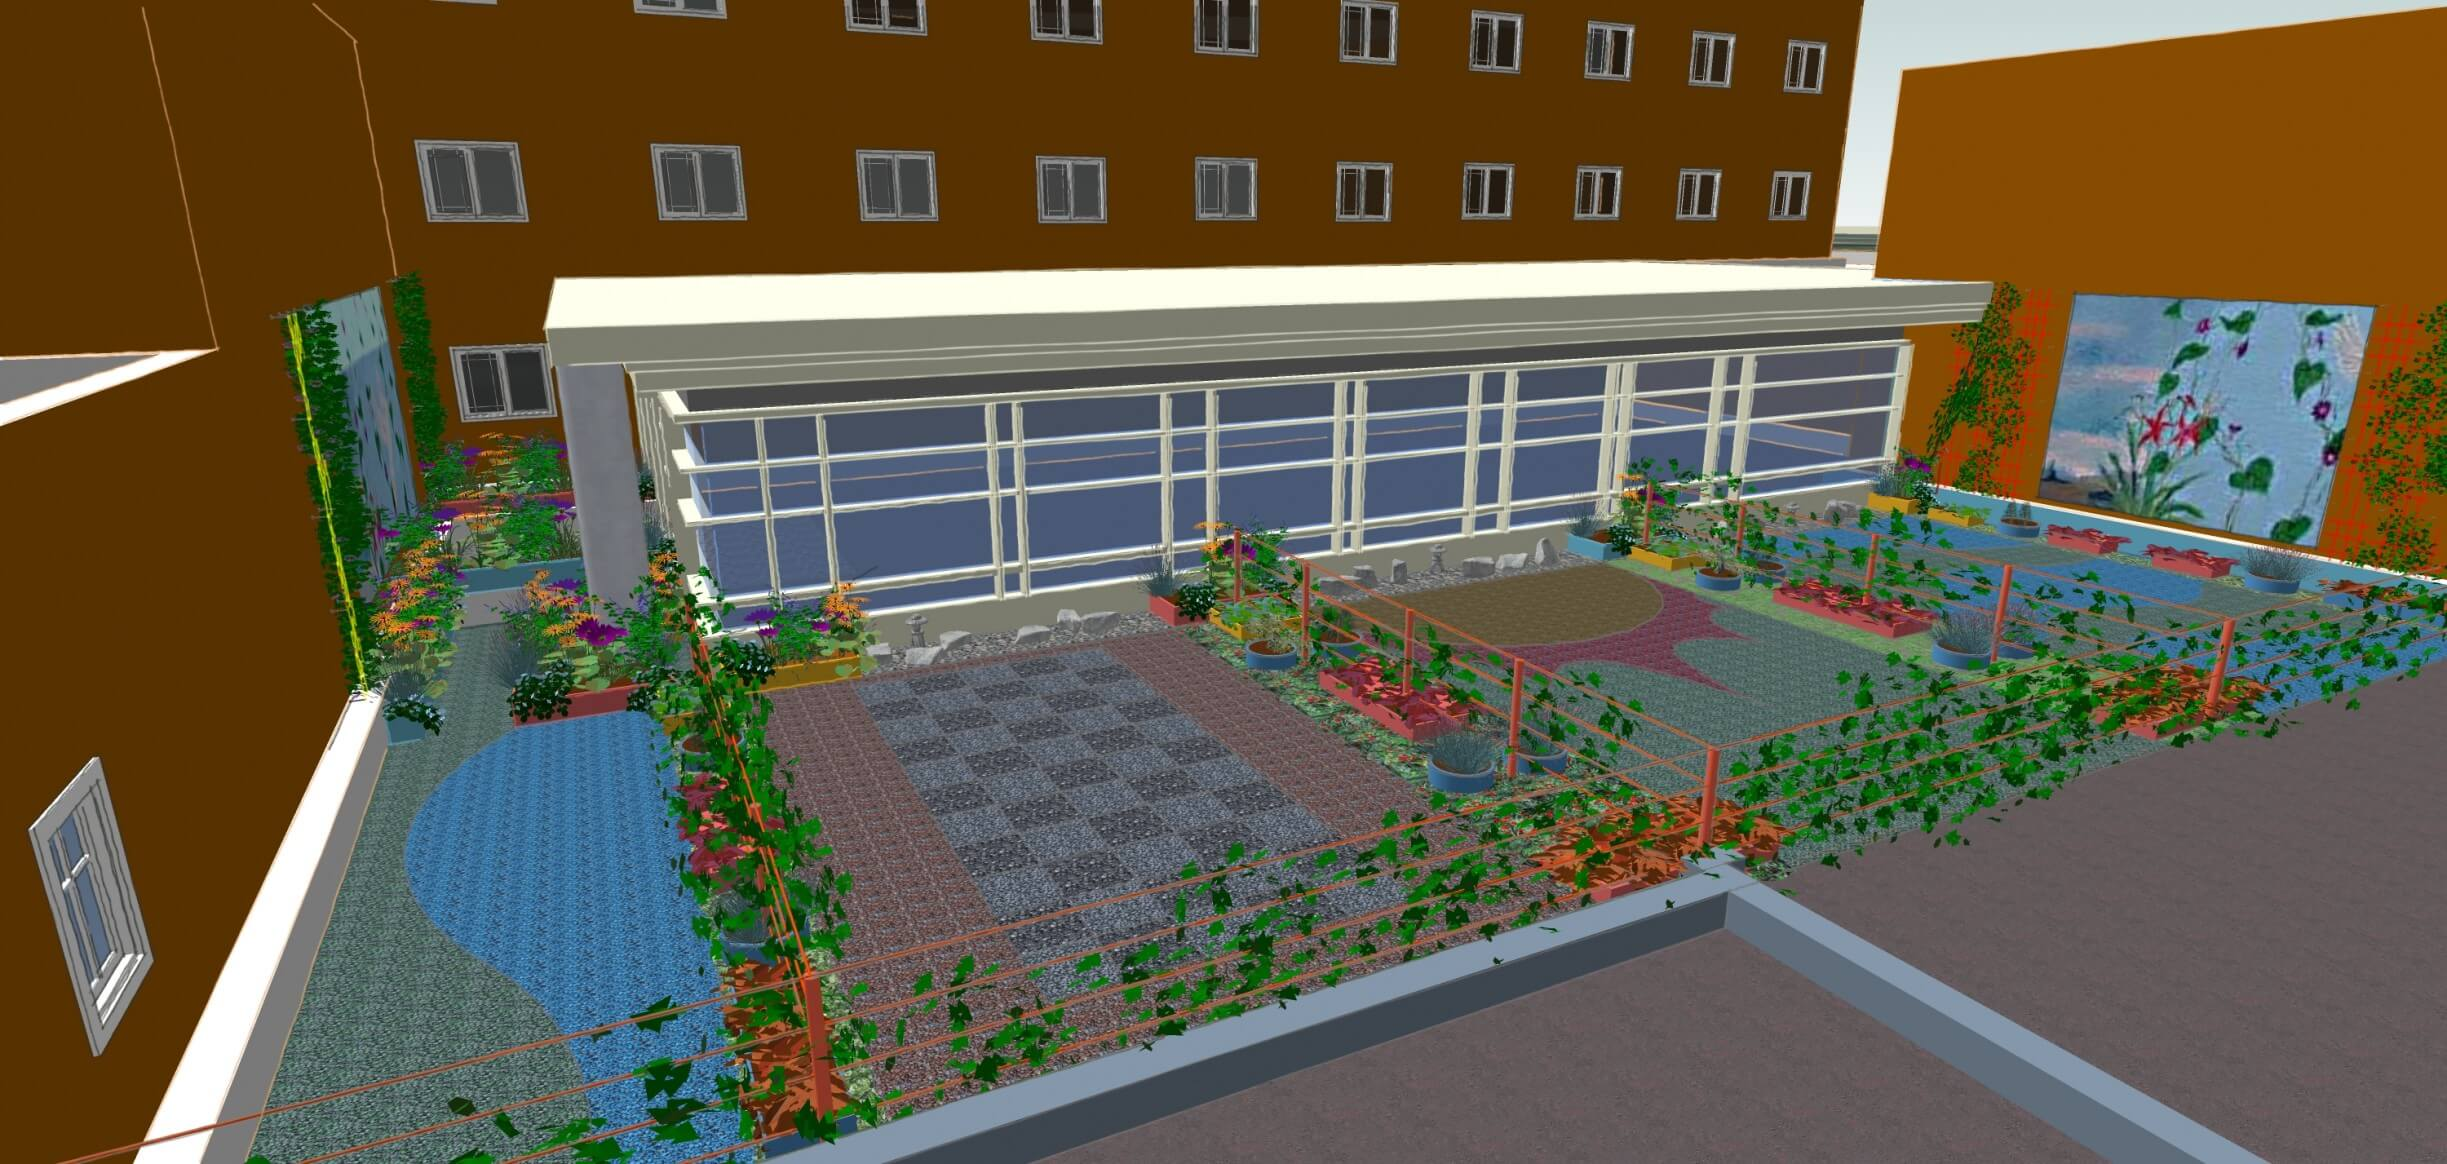 Landscape Design Northampton Ma Cooley Dickinson Hospital Rooftop Enhancements